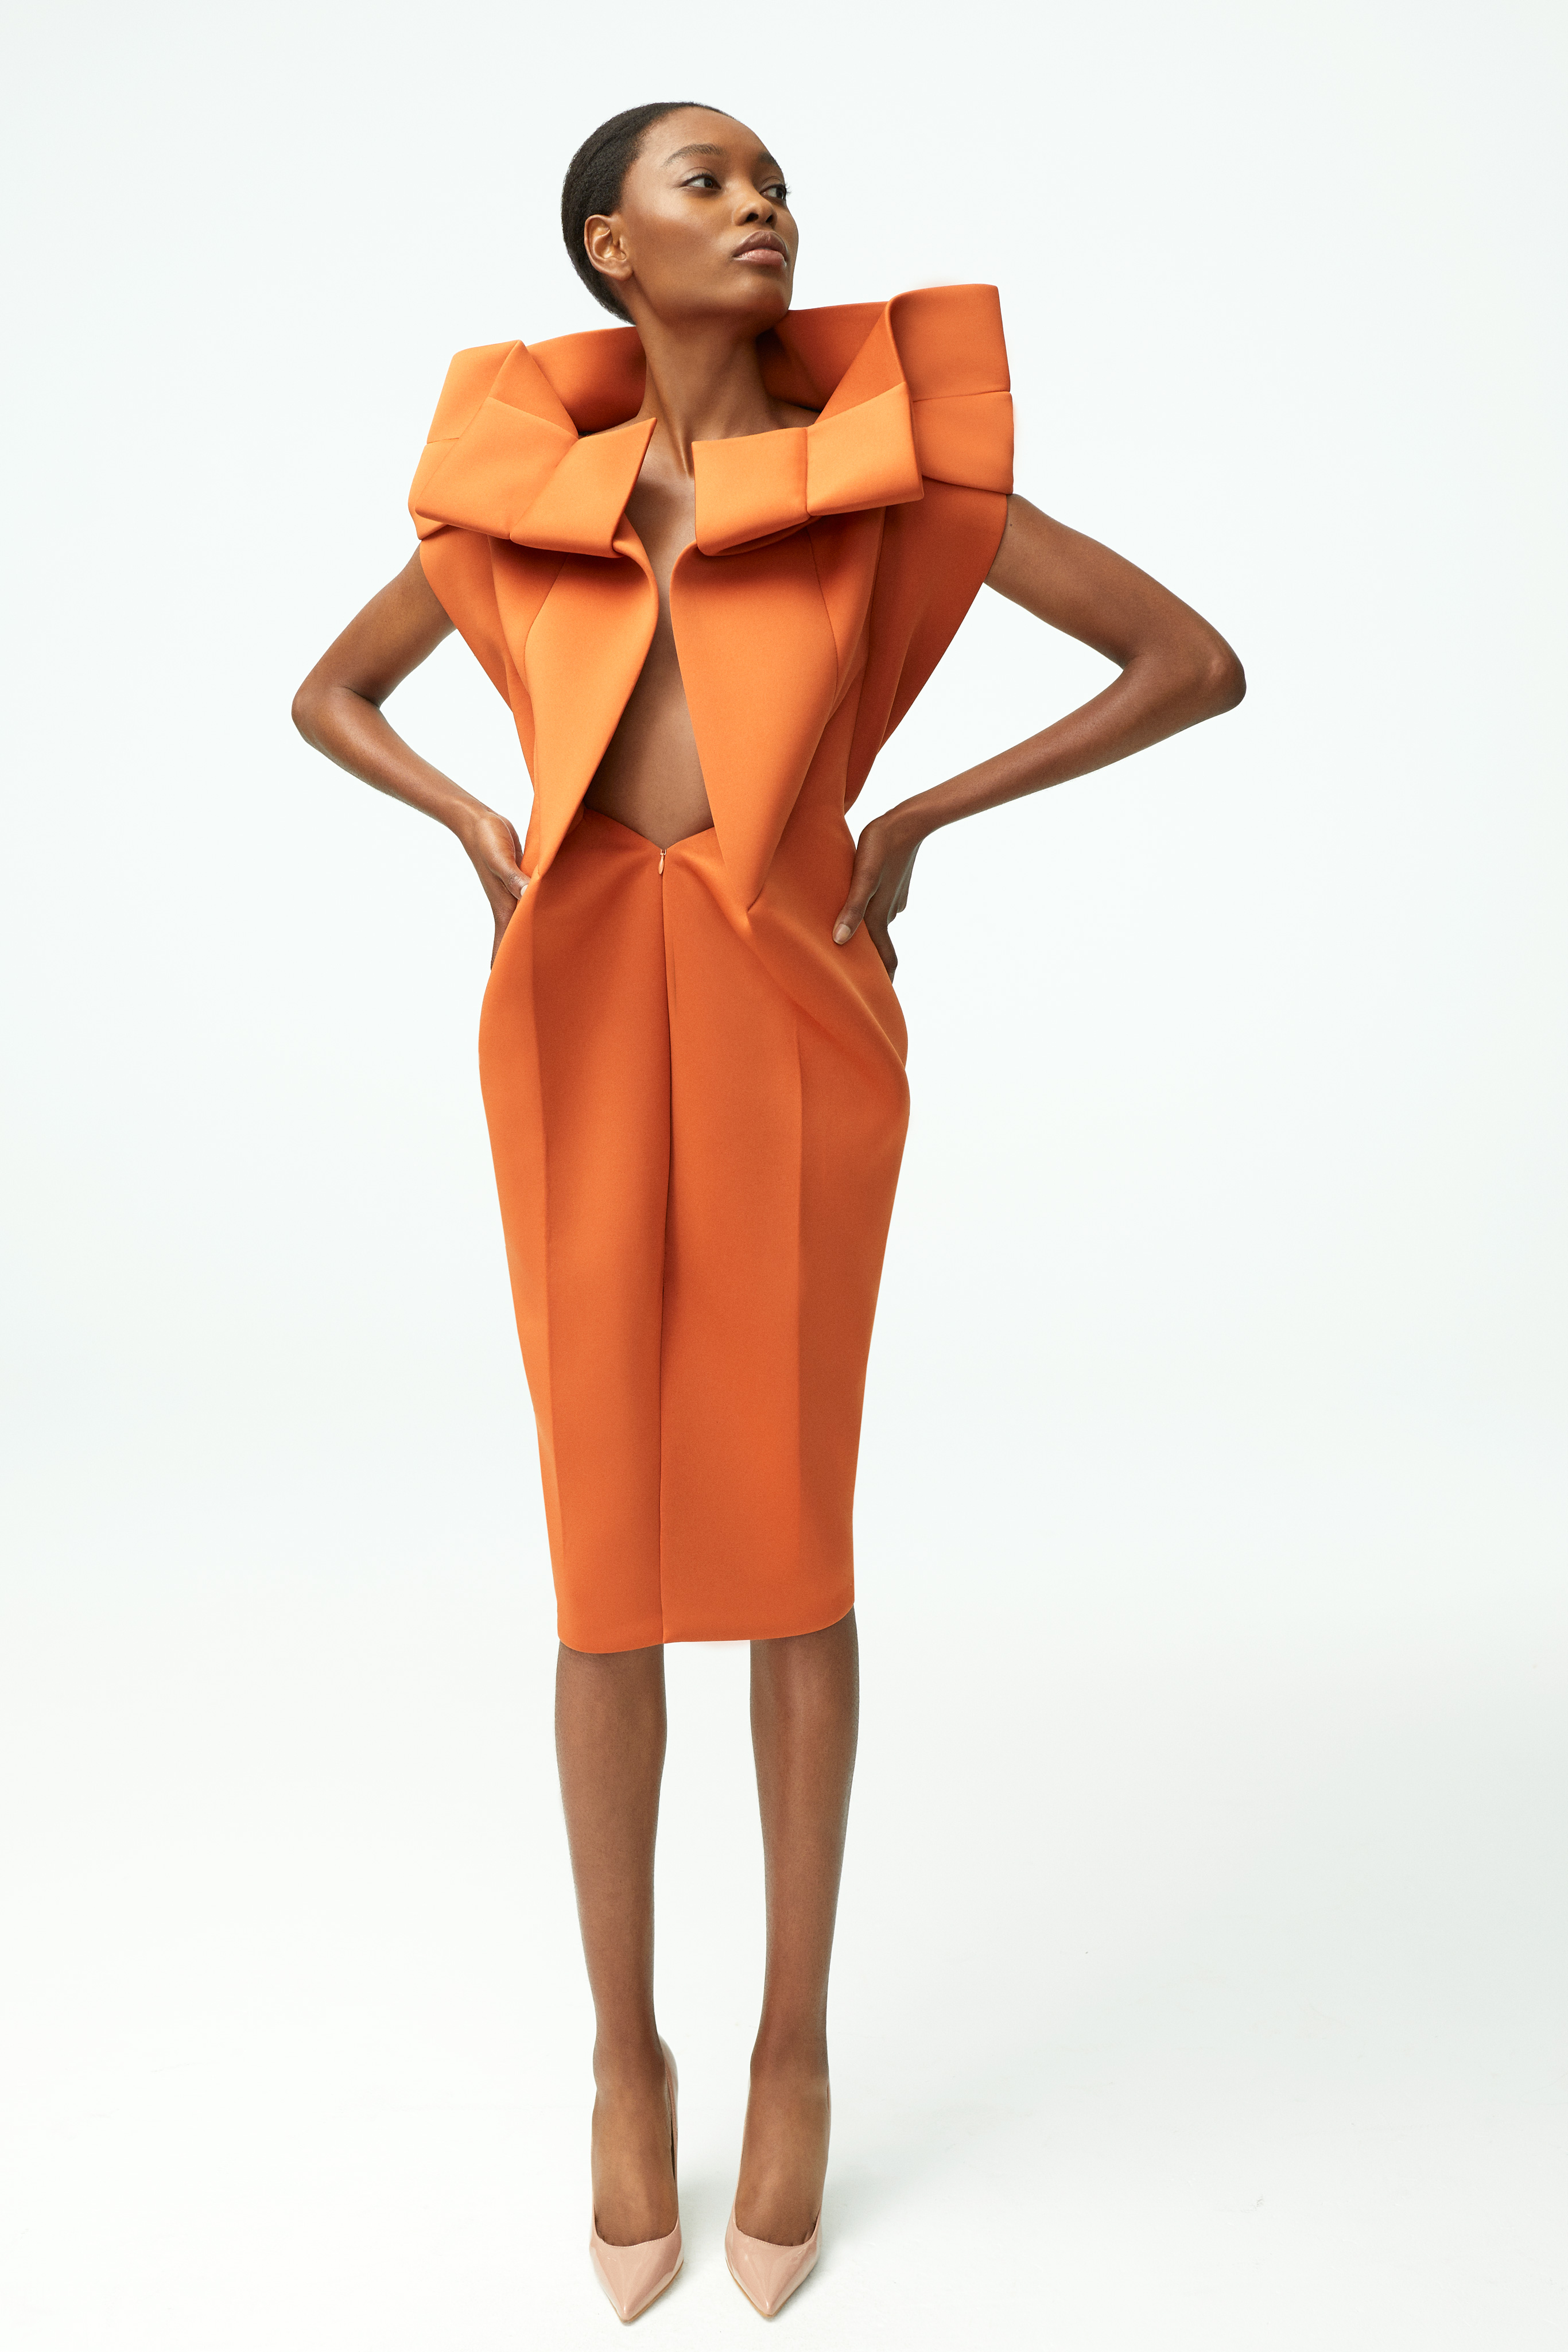 Neo Dress SS2021 Image: Amanda Pratt, Styling: Dimeji Alara